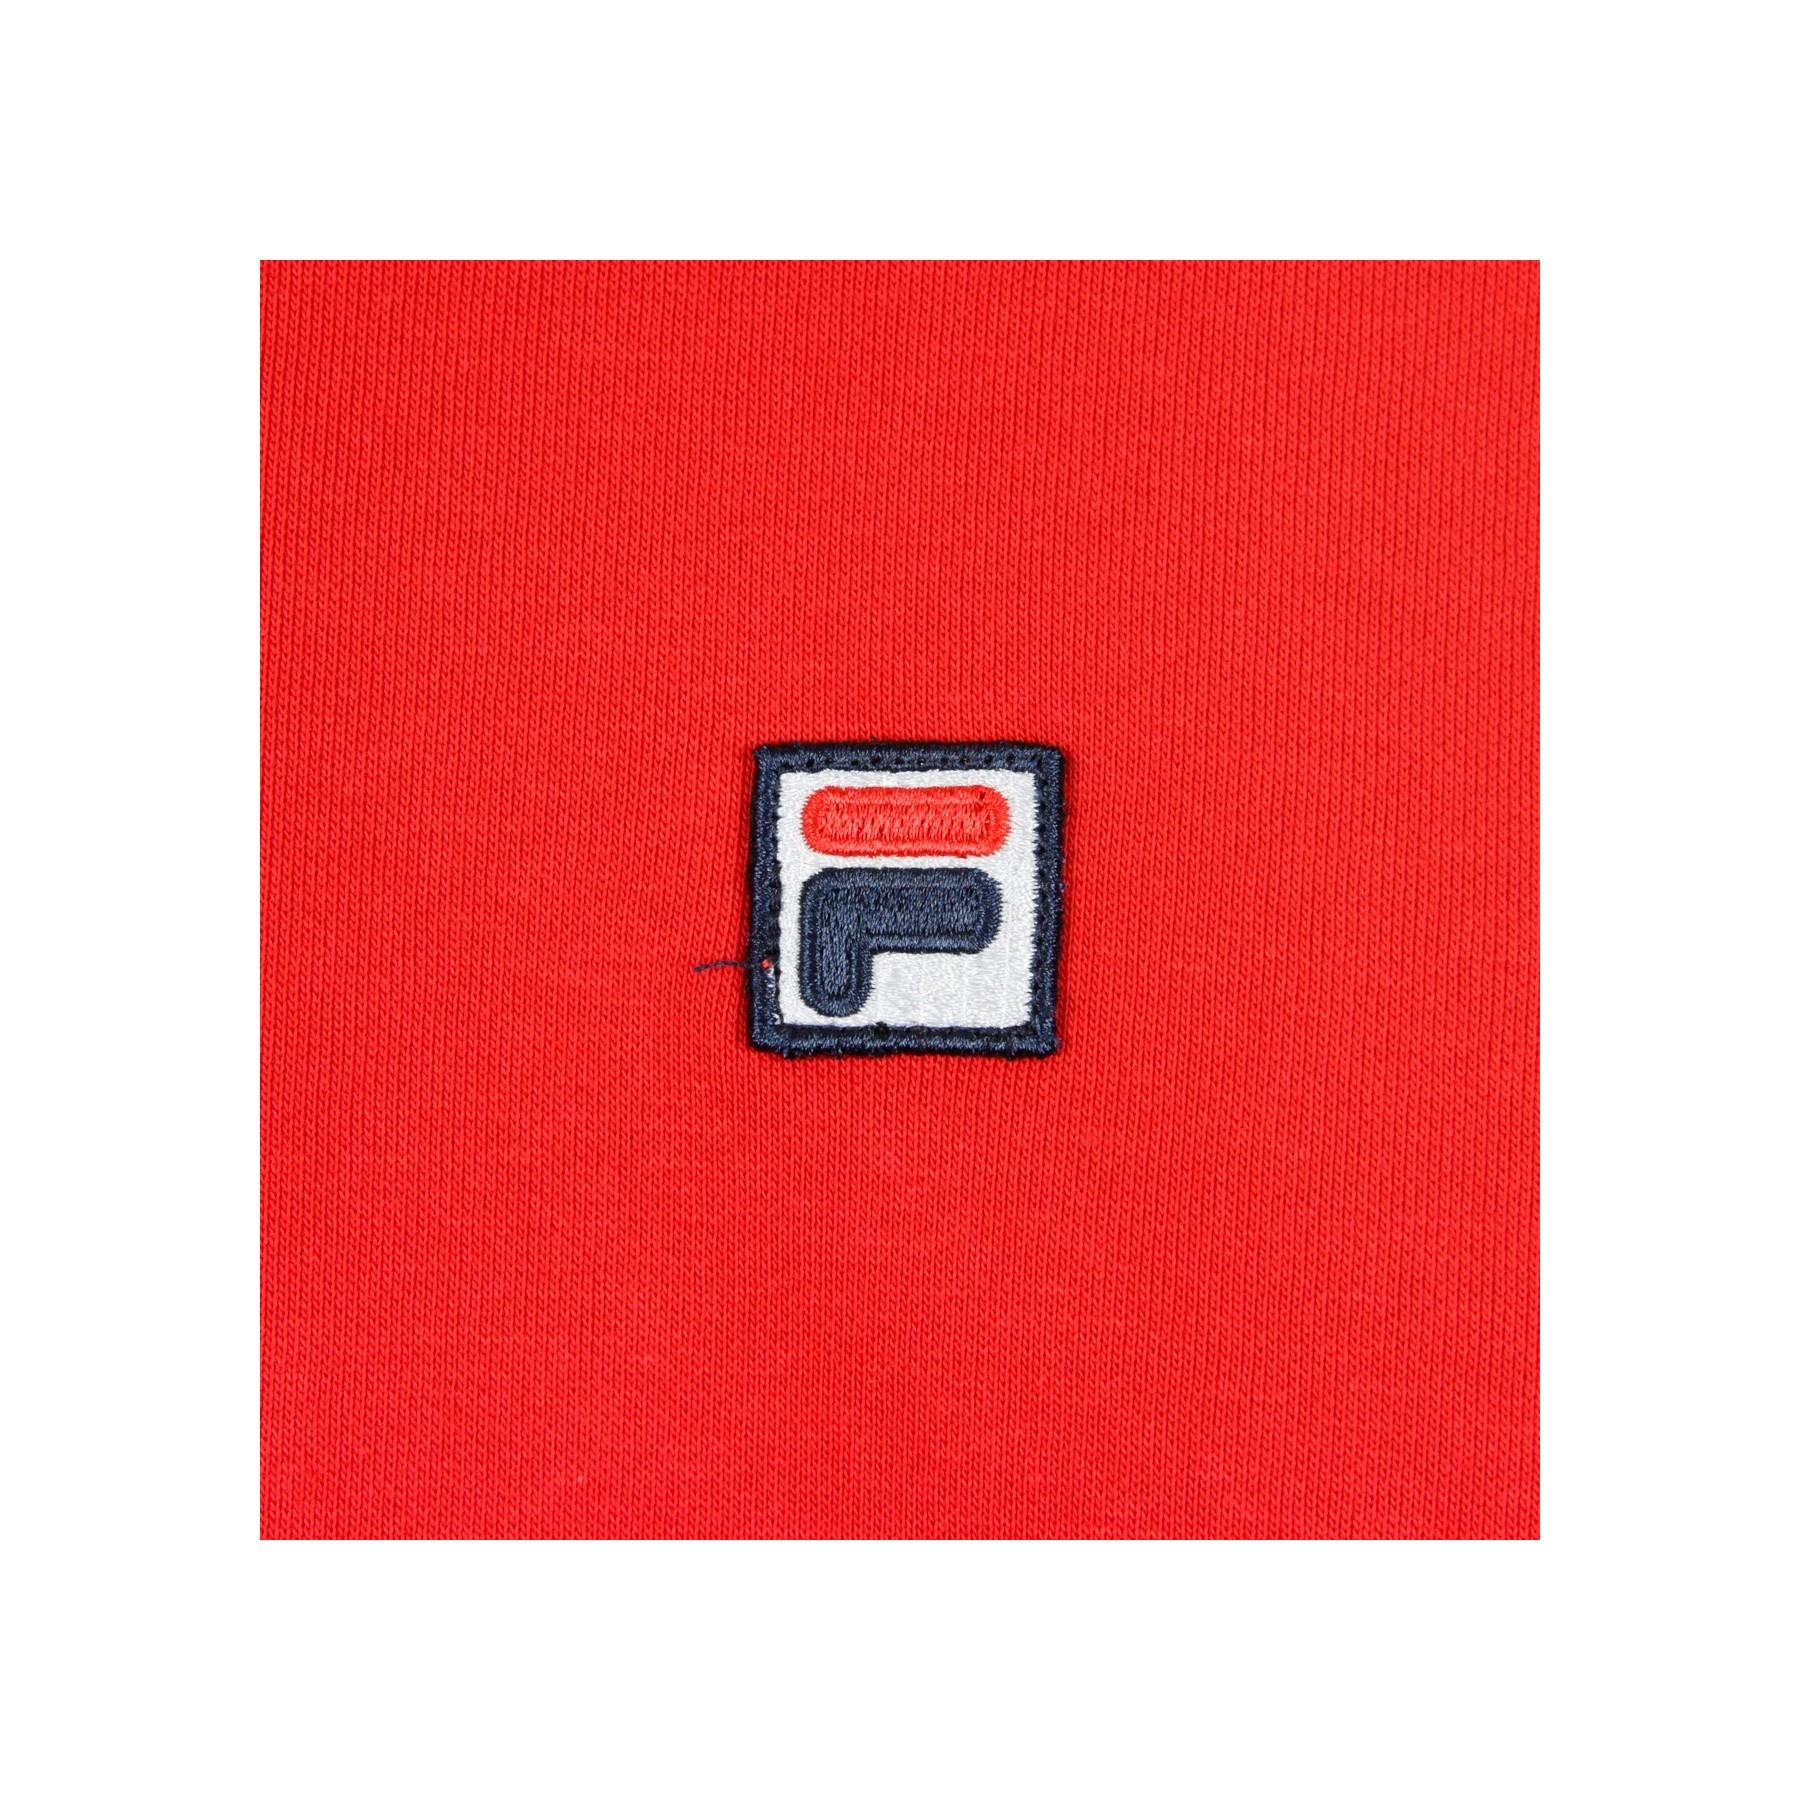 FELPA CAPPUCCIO FLORESHA TRUE RED